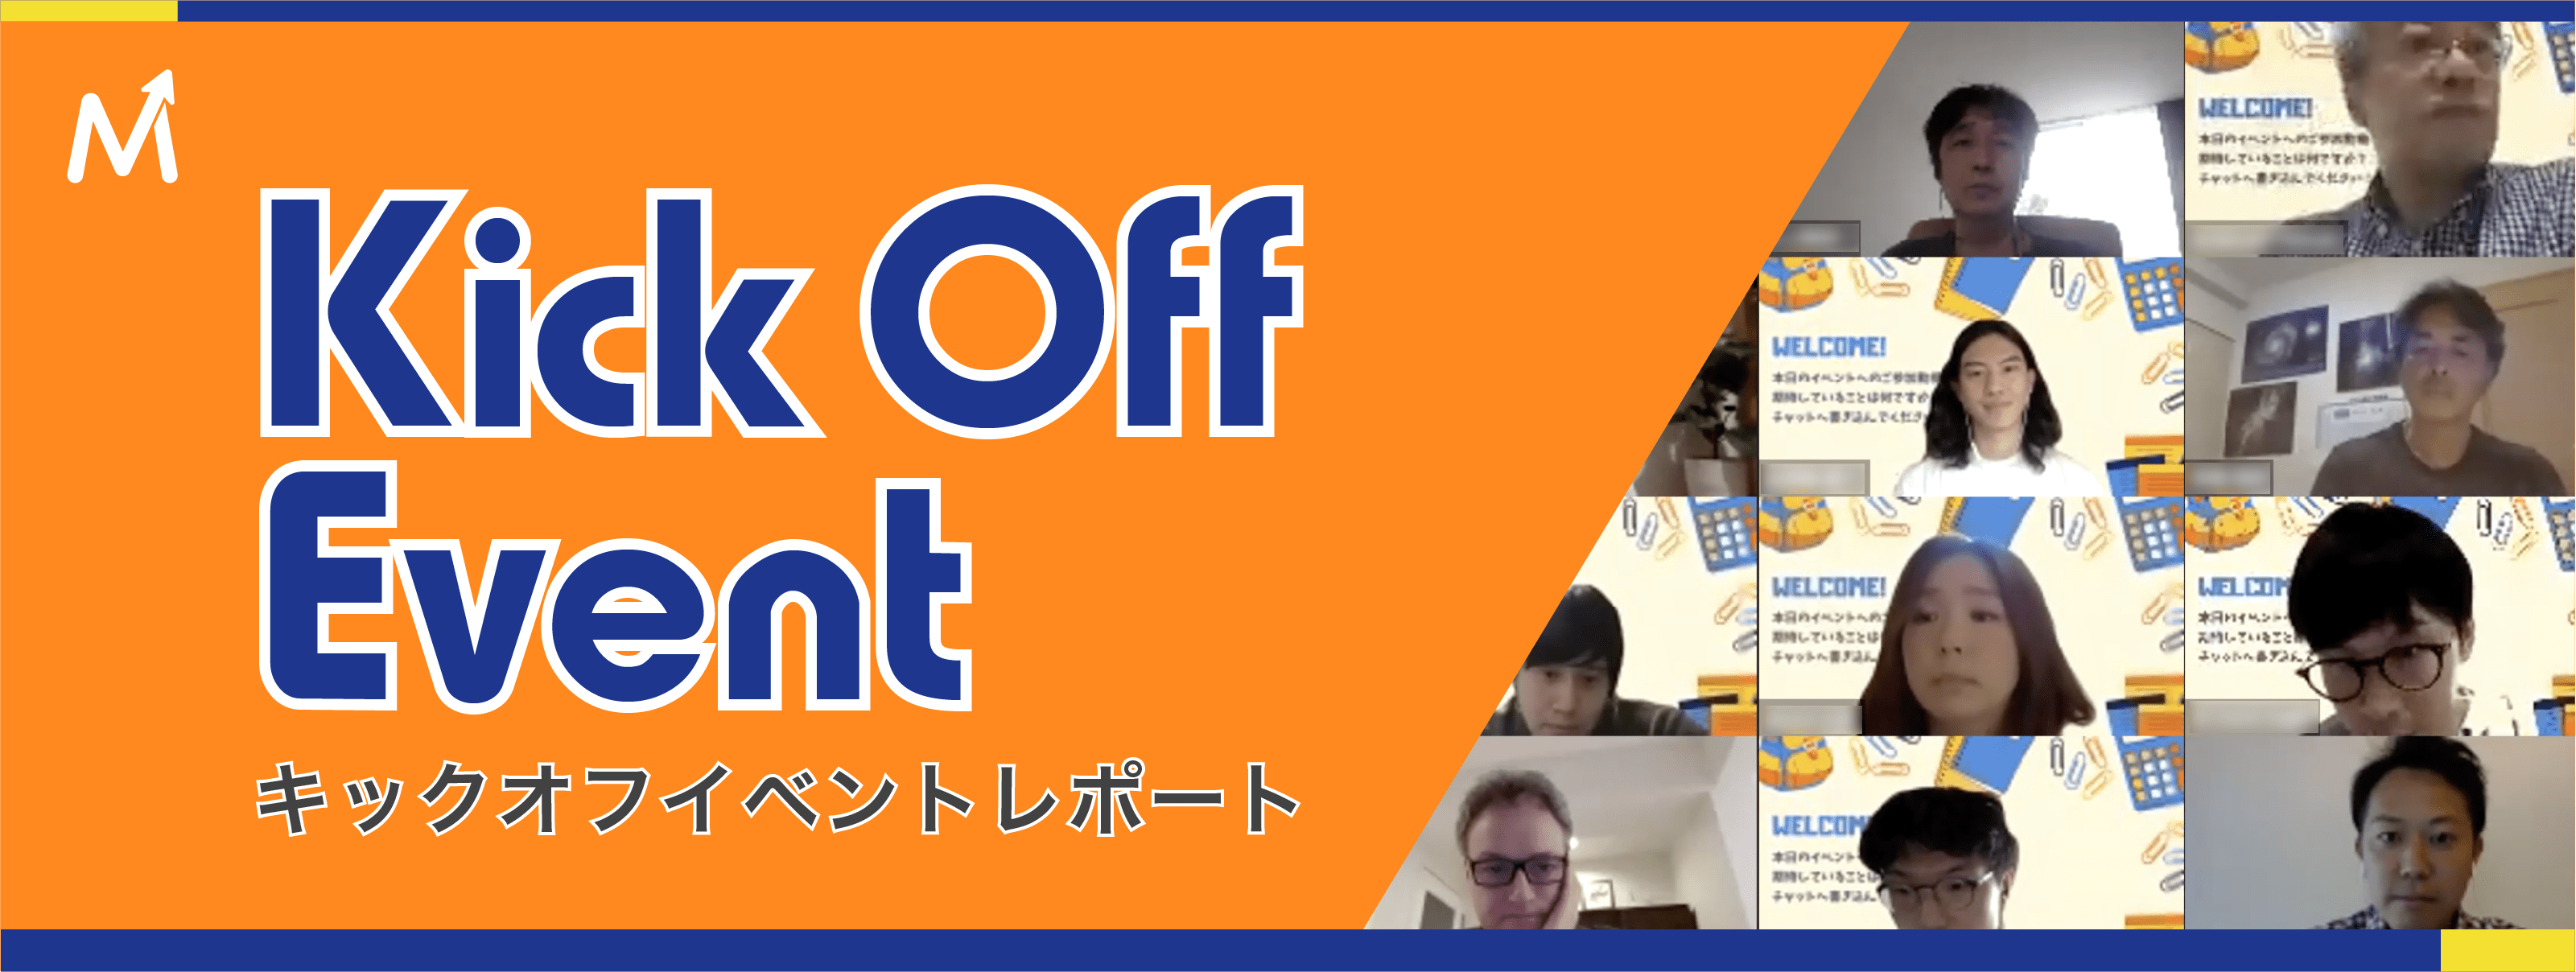 blog_キックオフイベントレポート